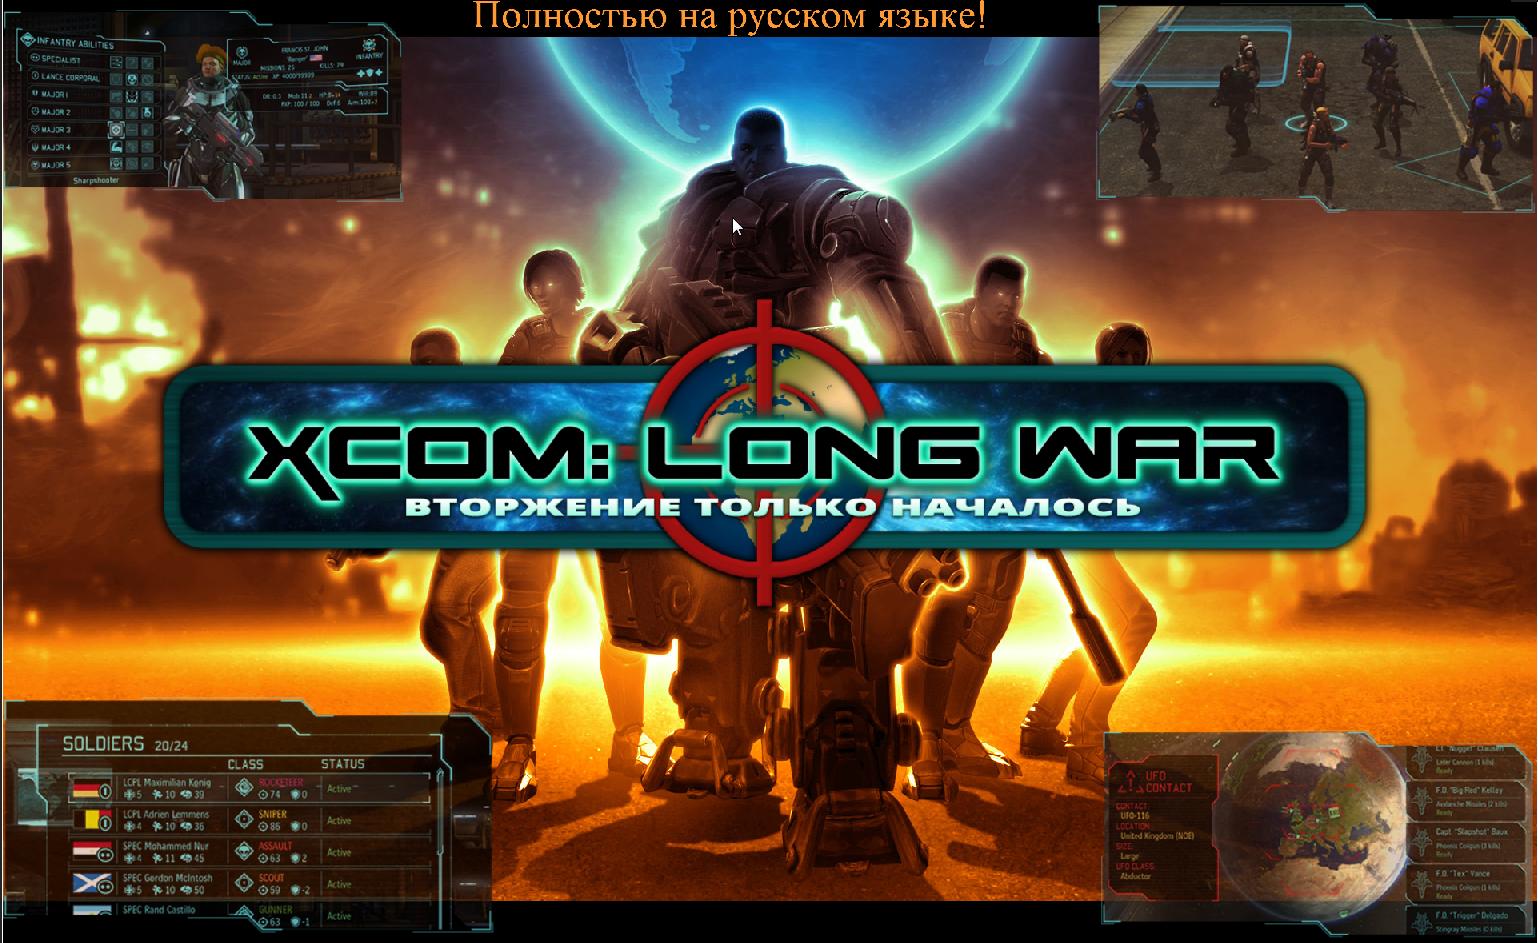 Long War (RUS) 1.05